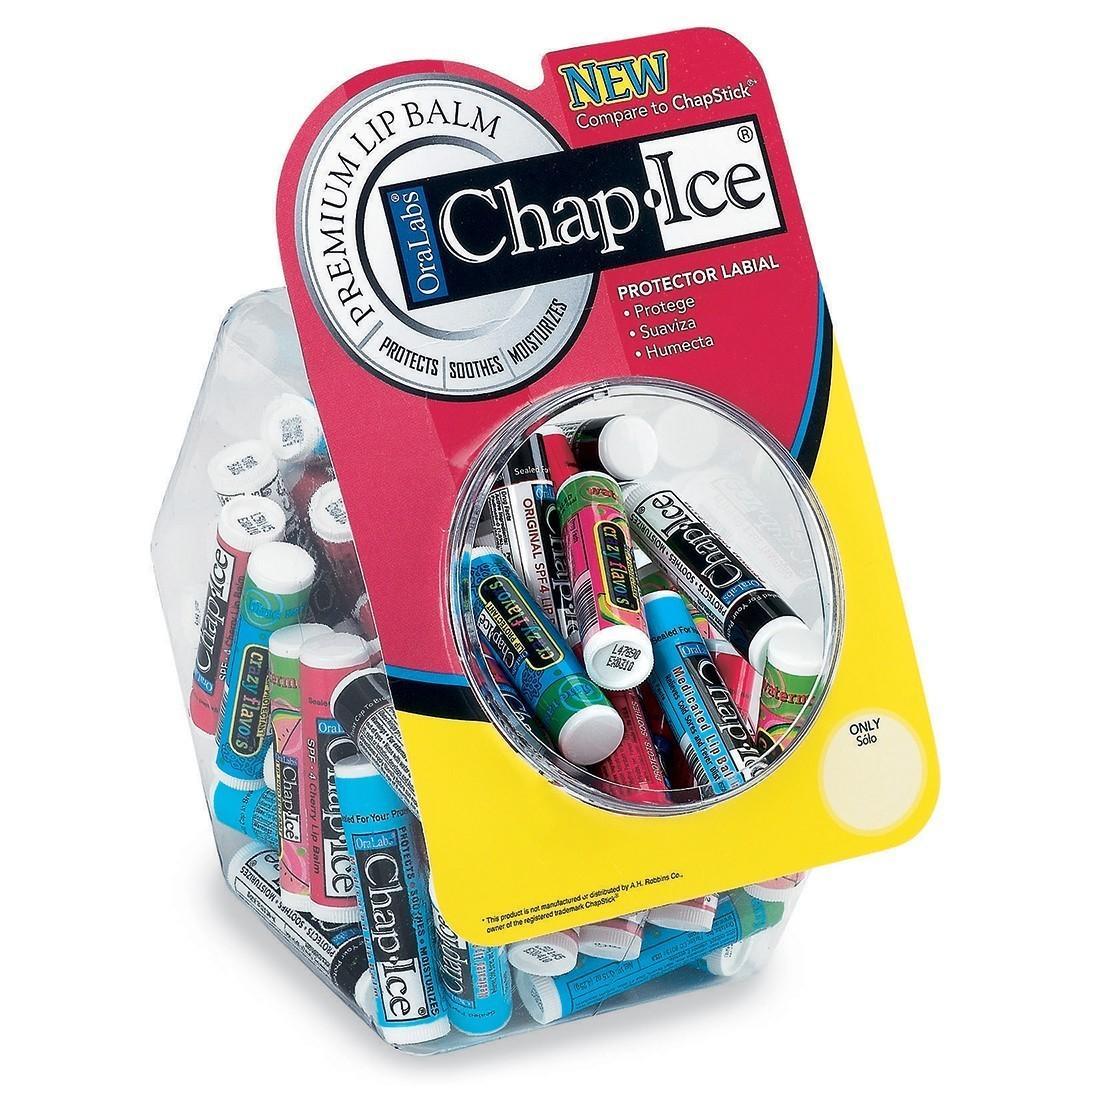 Large Chap-Ice® Lip Balm [image]